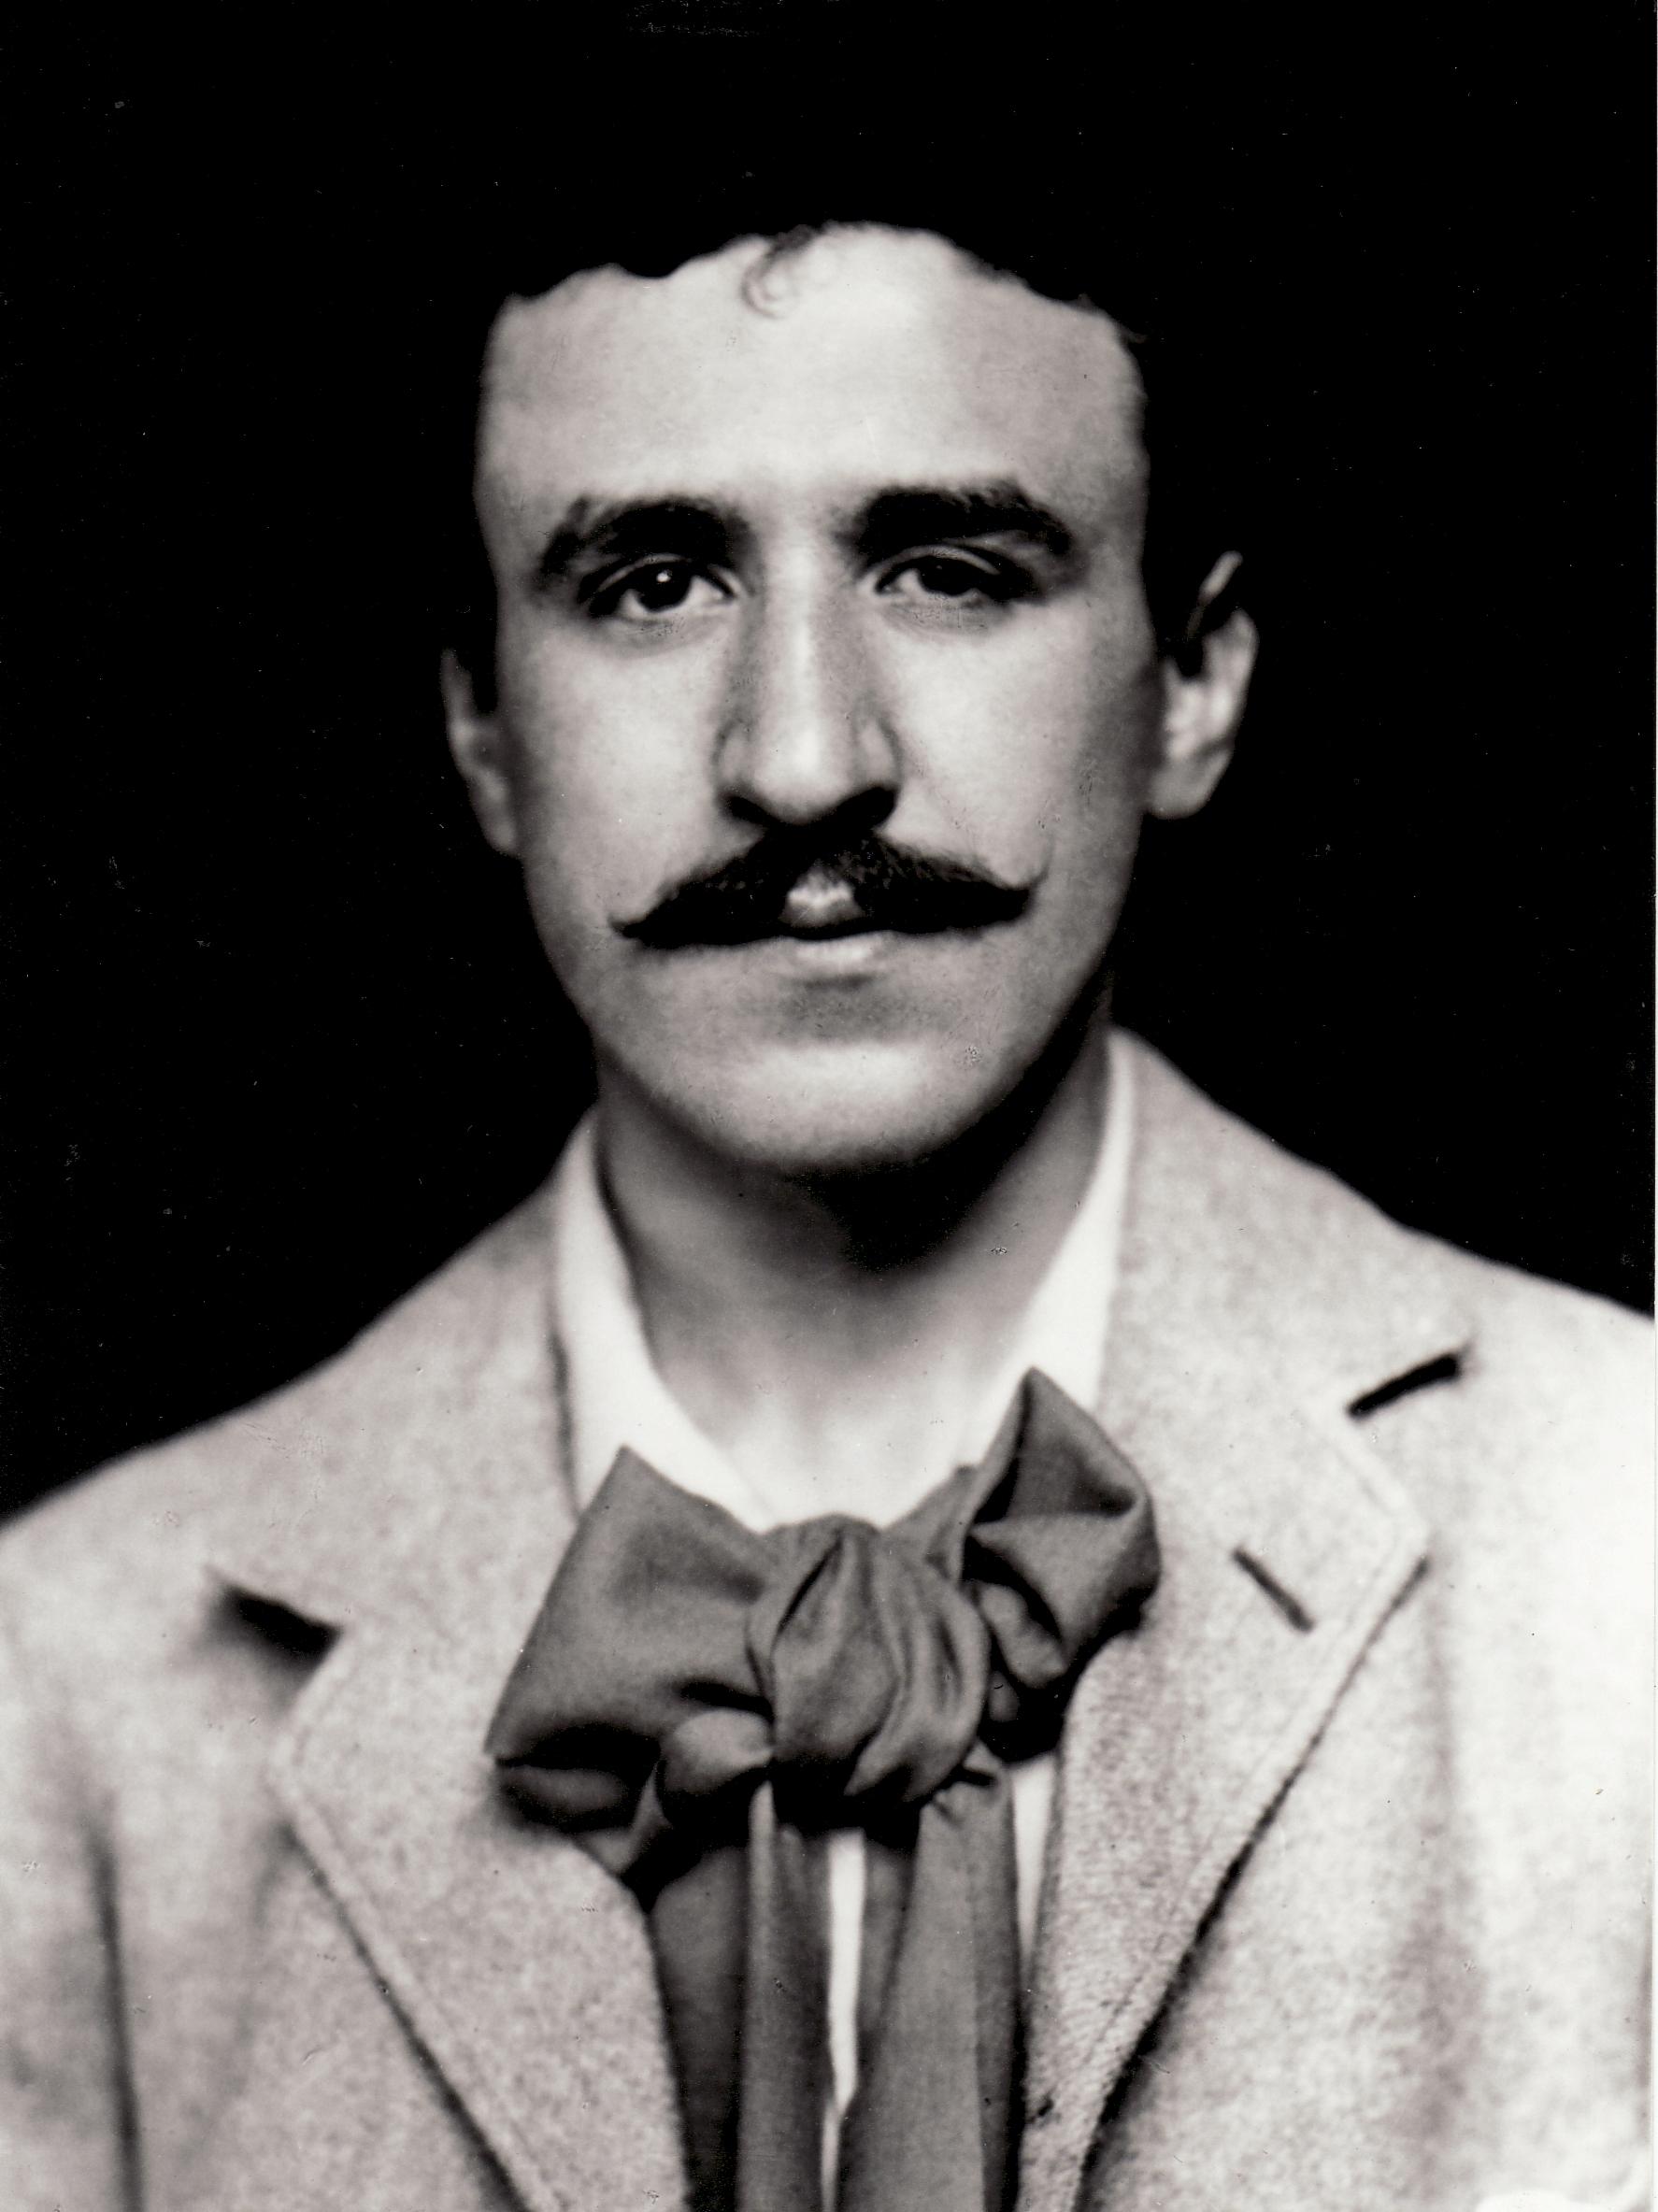 Charles Rennie Mackintosh. Image credit: T & R Annan & Son